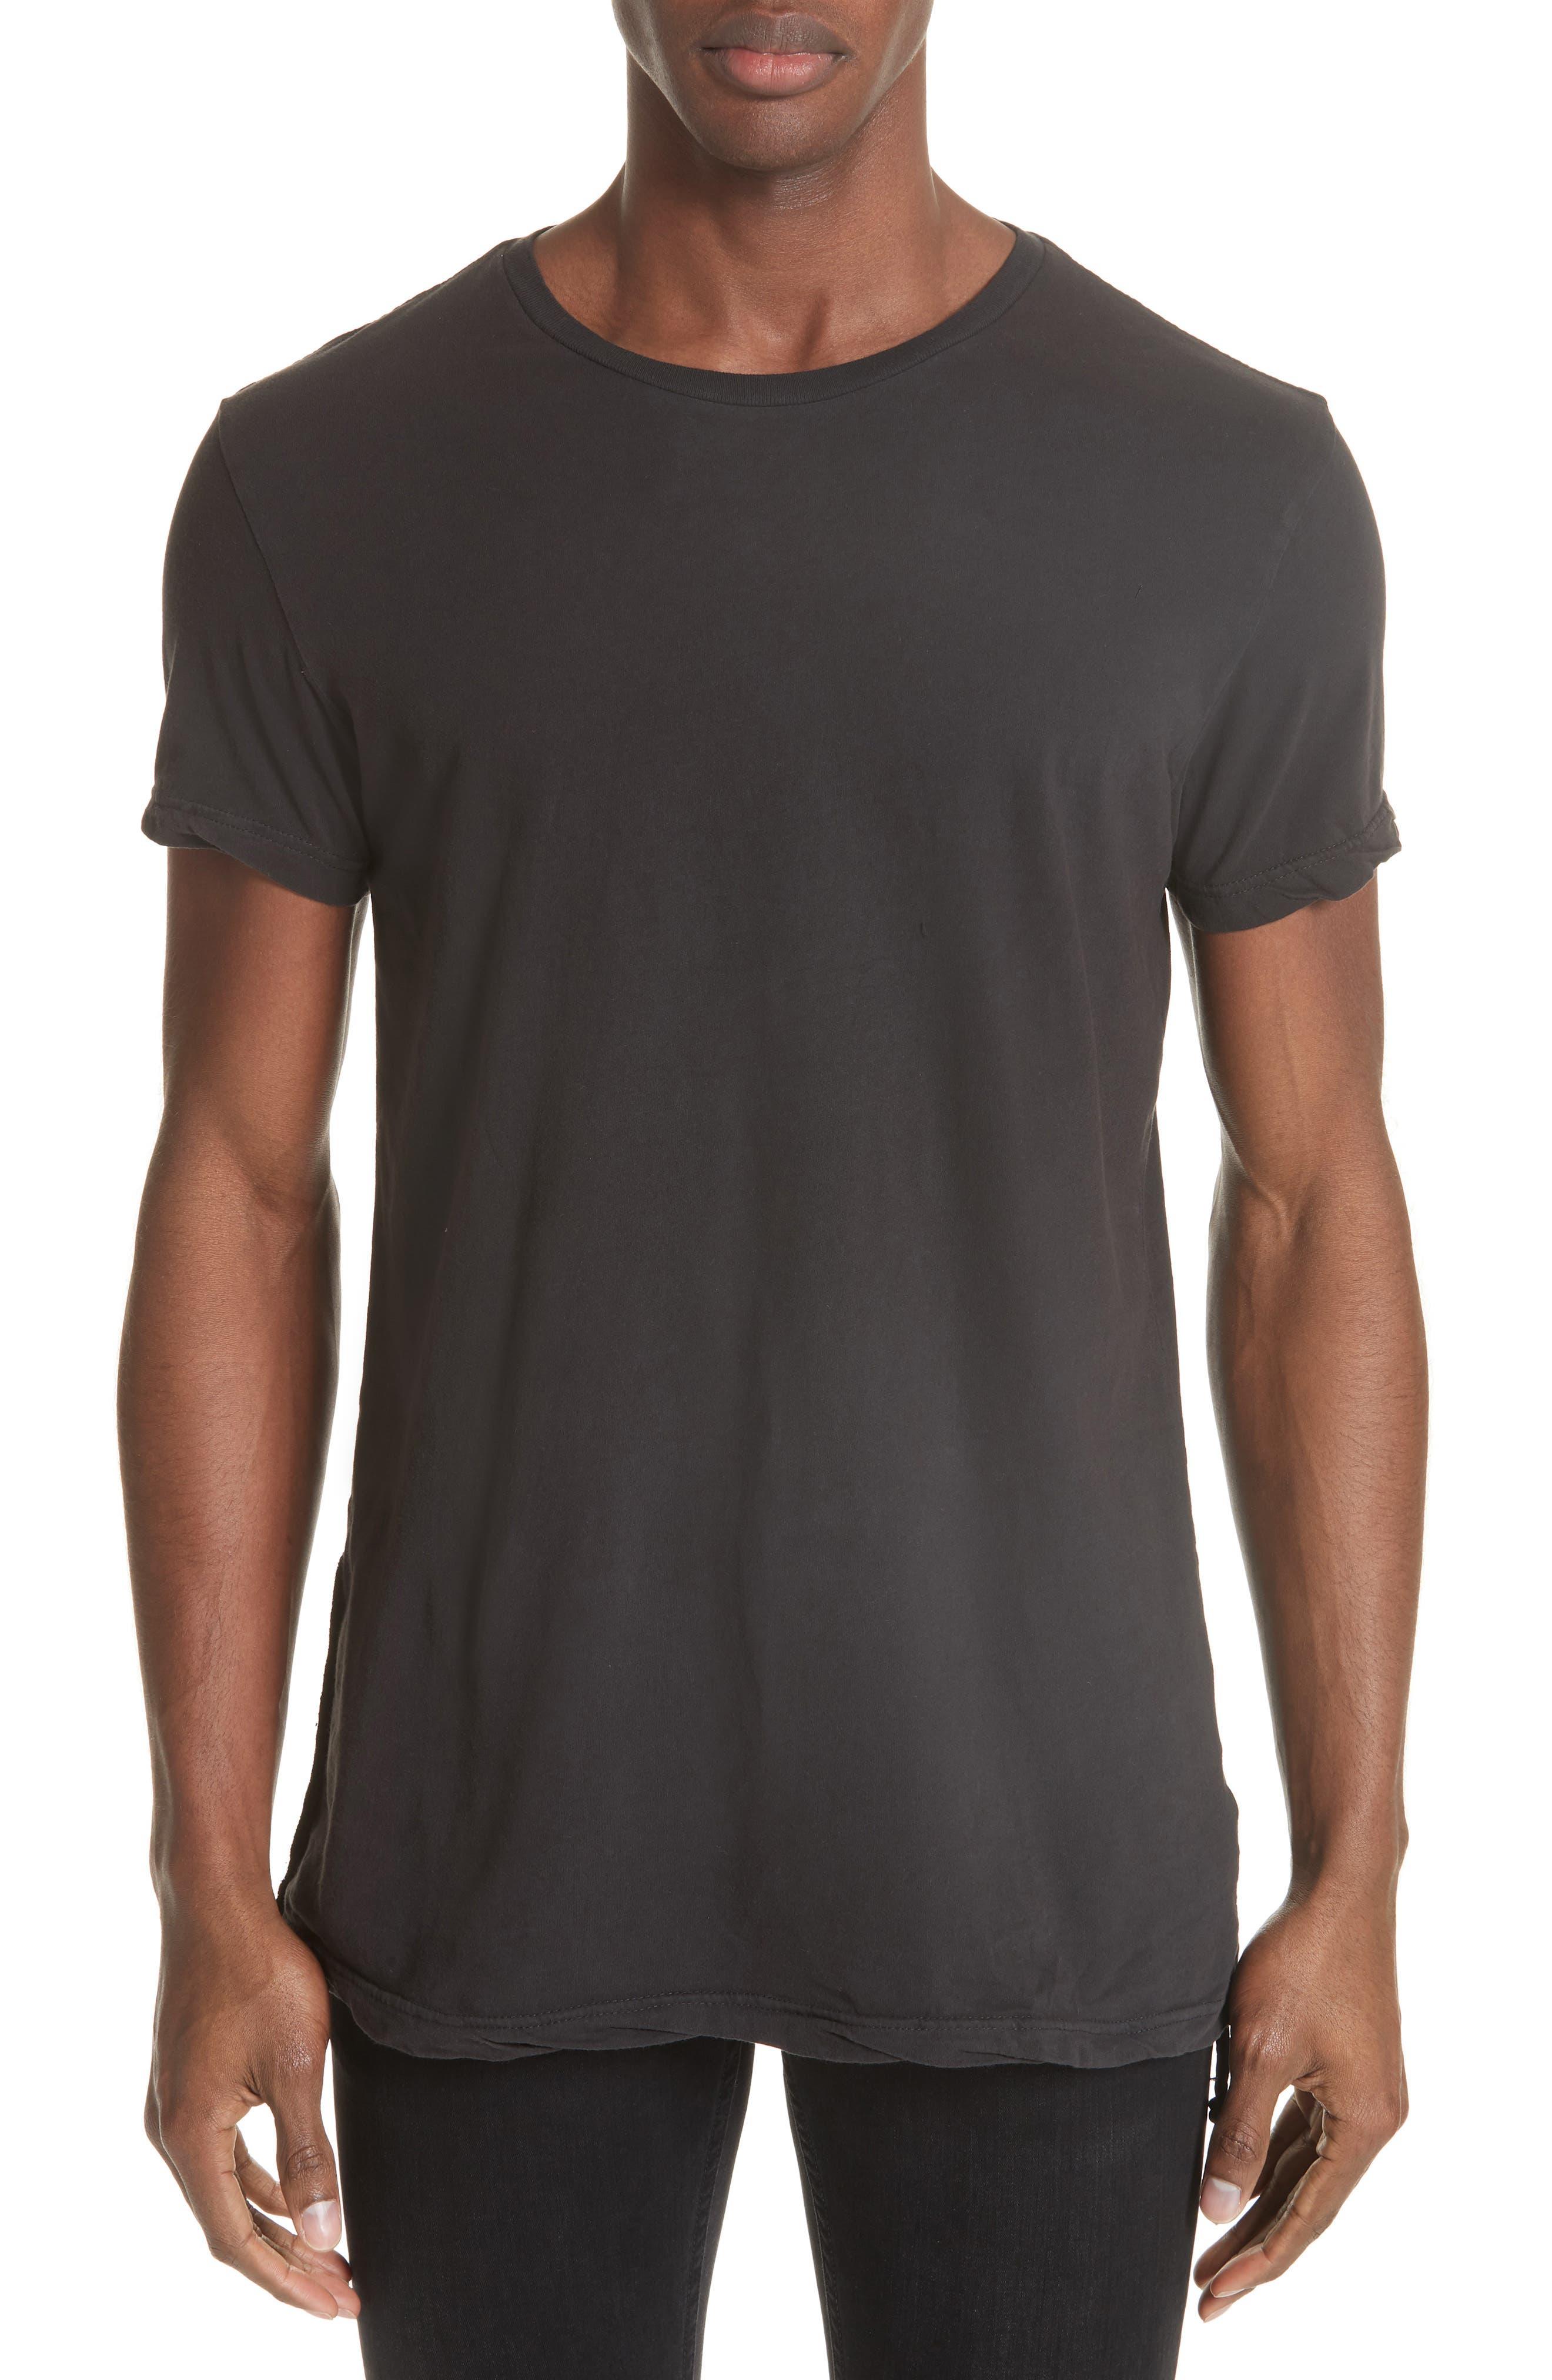 Seeing Lines T-Shirt,                             Main thumbnail 1, color,                             BLACK